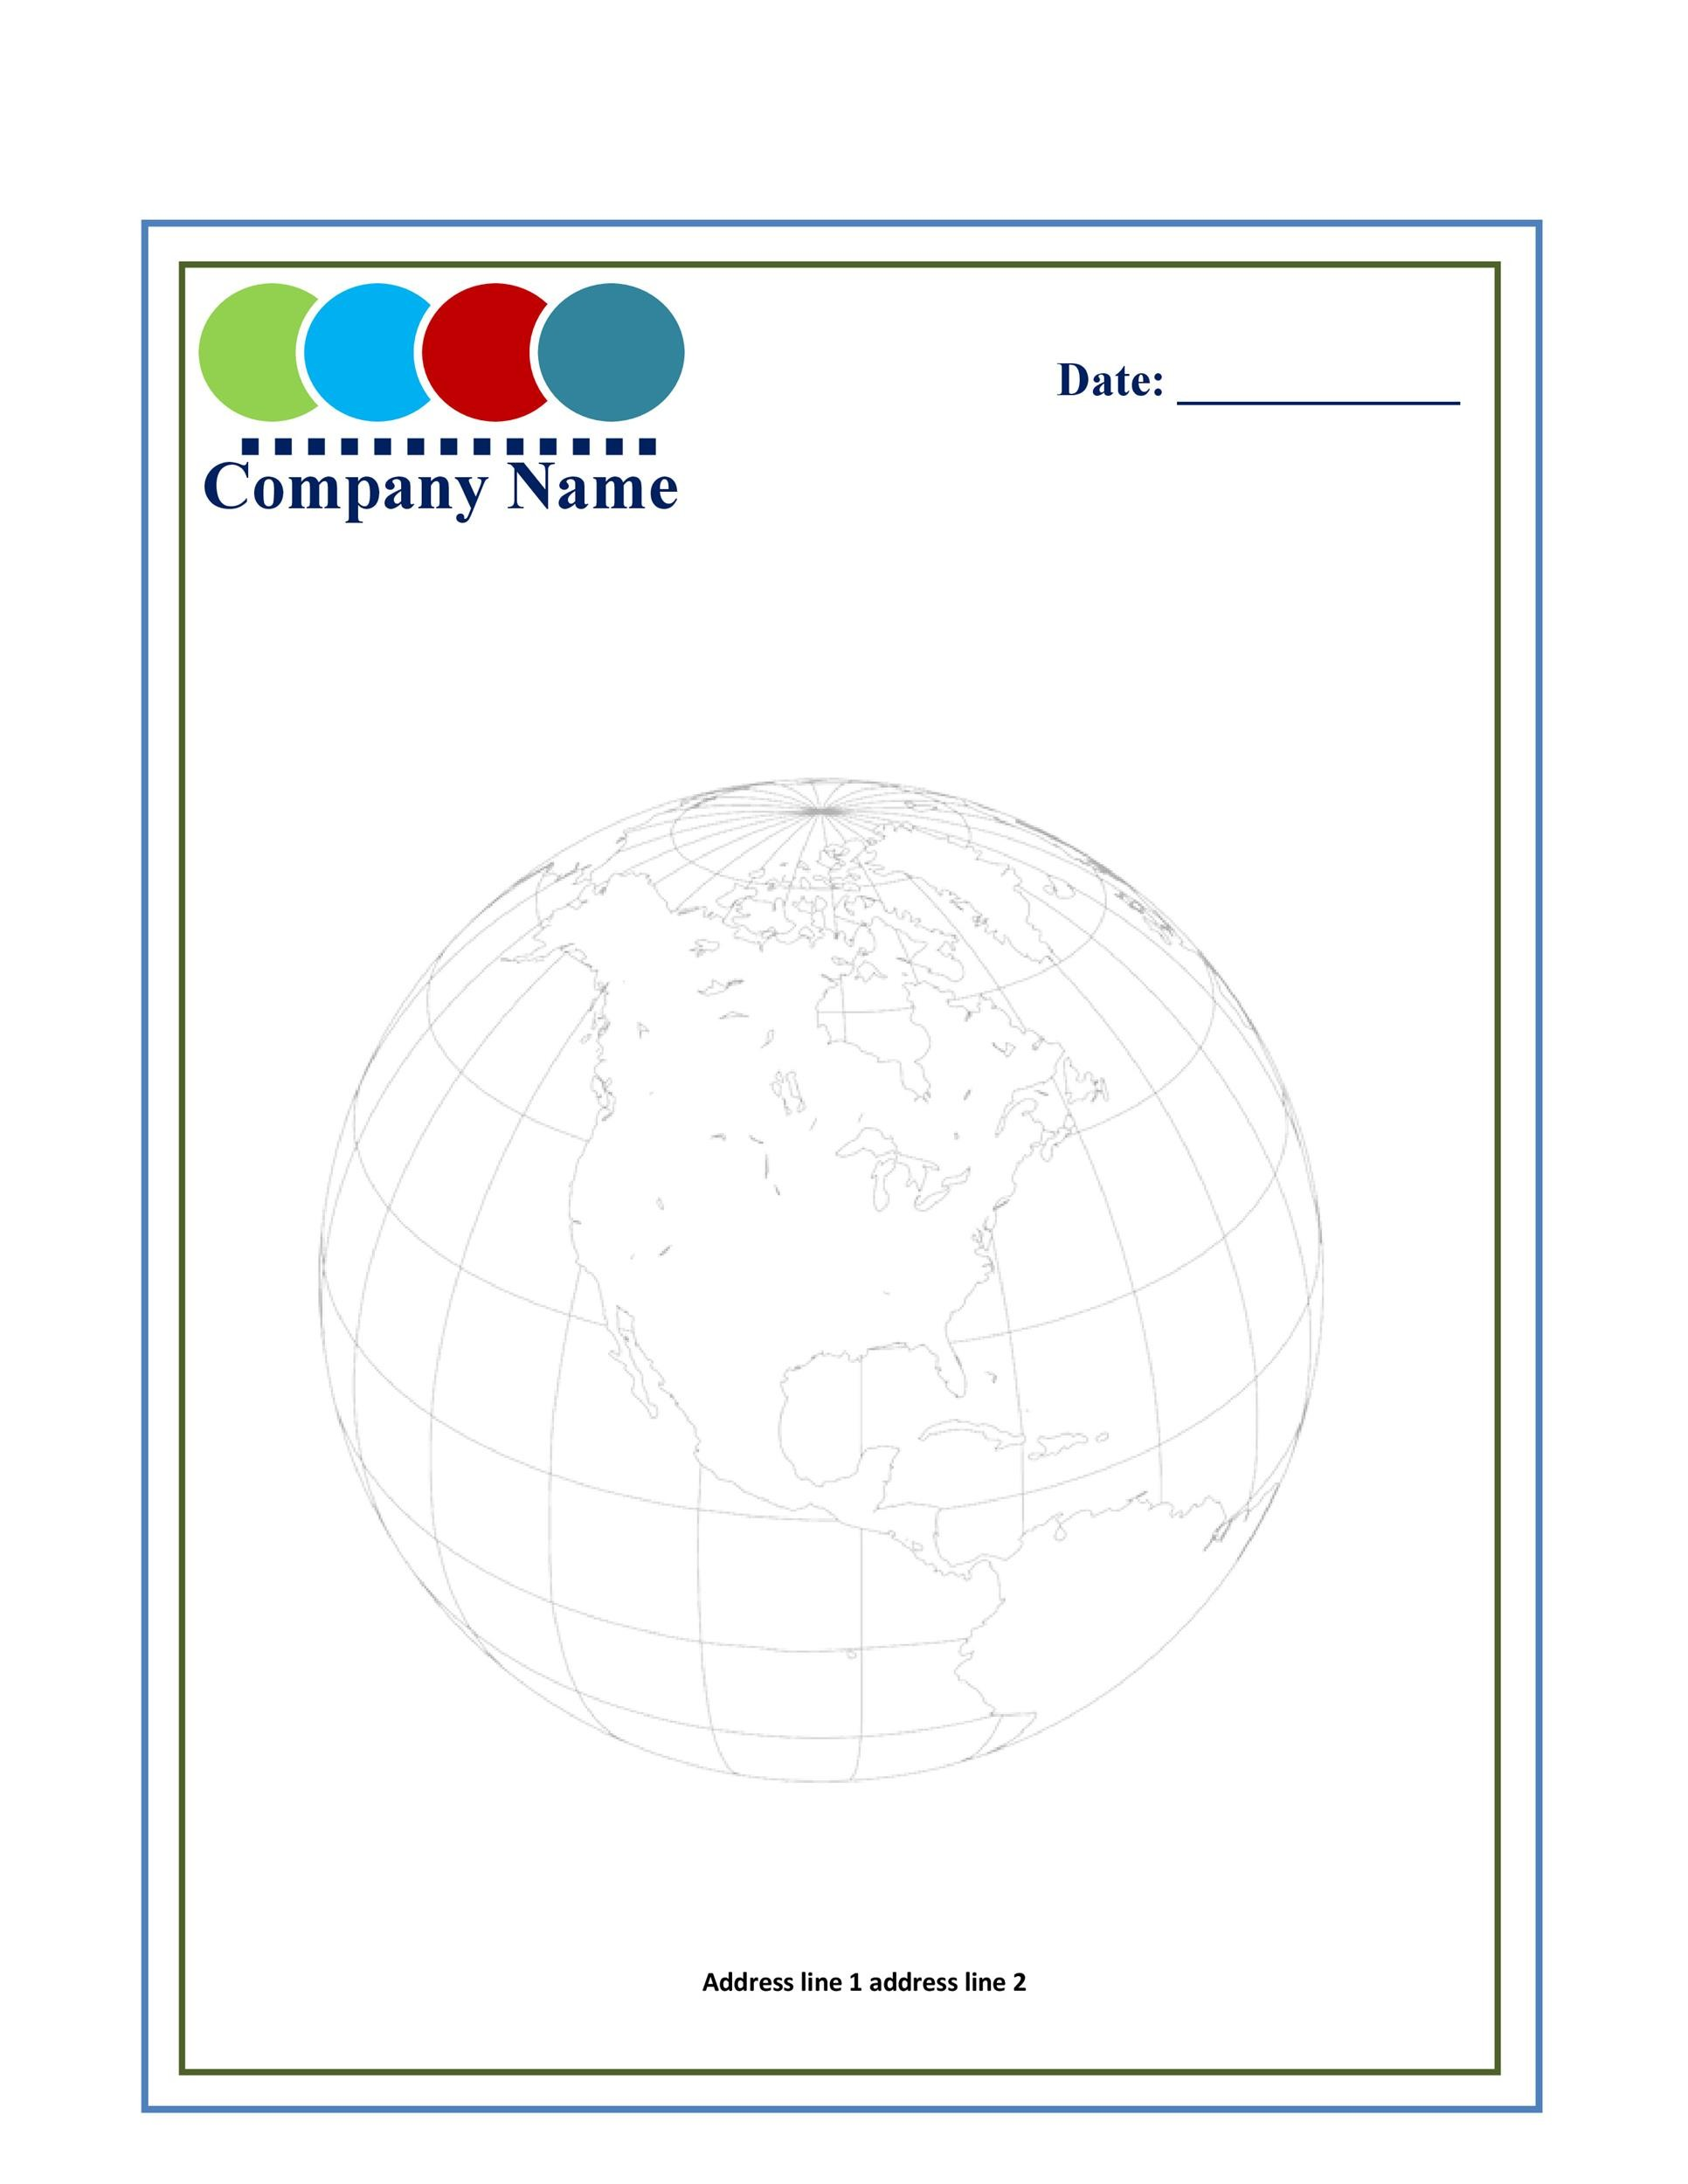 45+ Free Letterhead Templates & Examples (Company